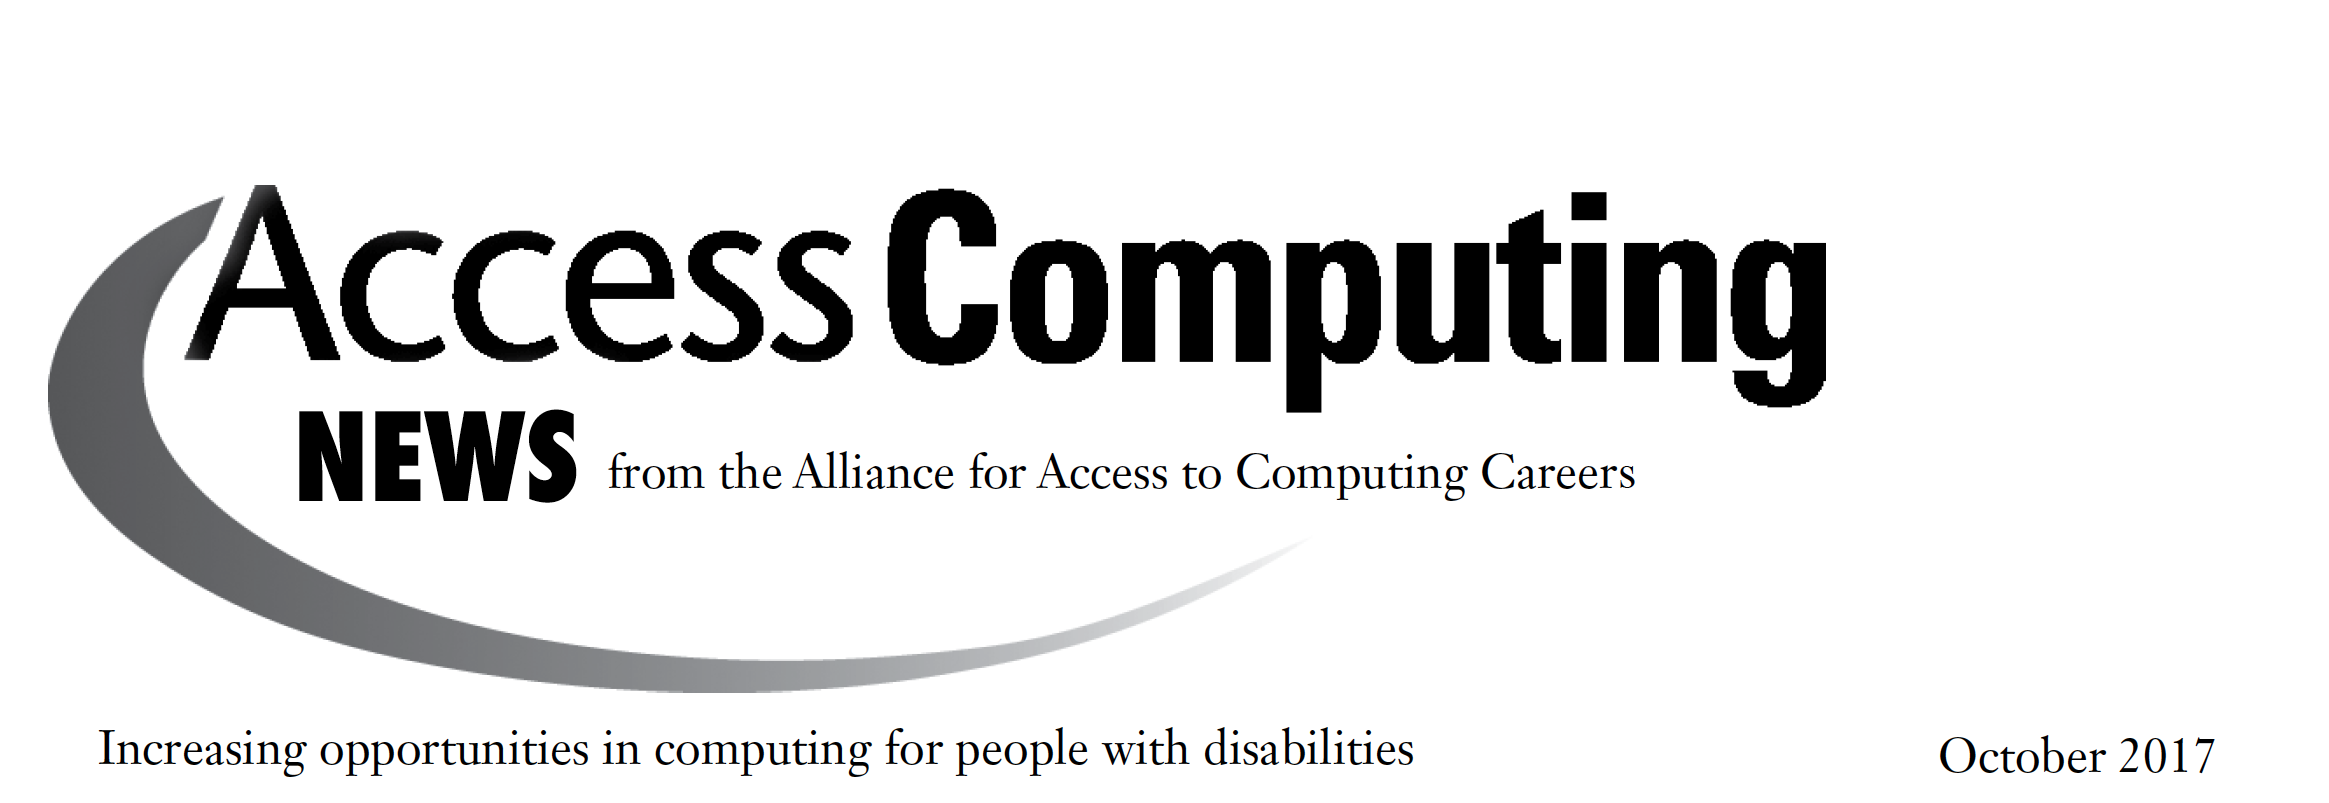 AccessComputing News October 2017 Header.